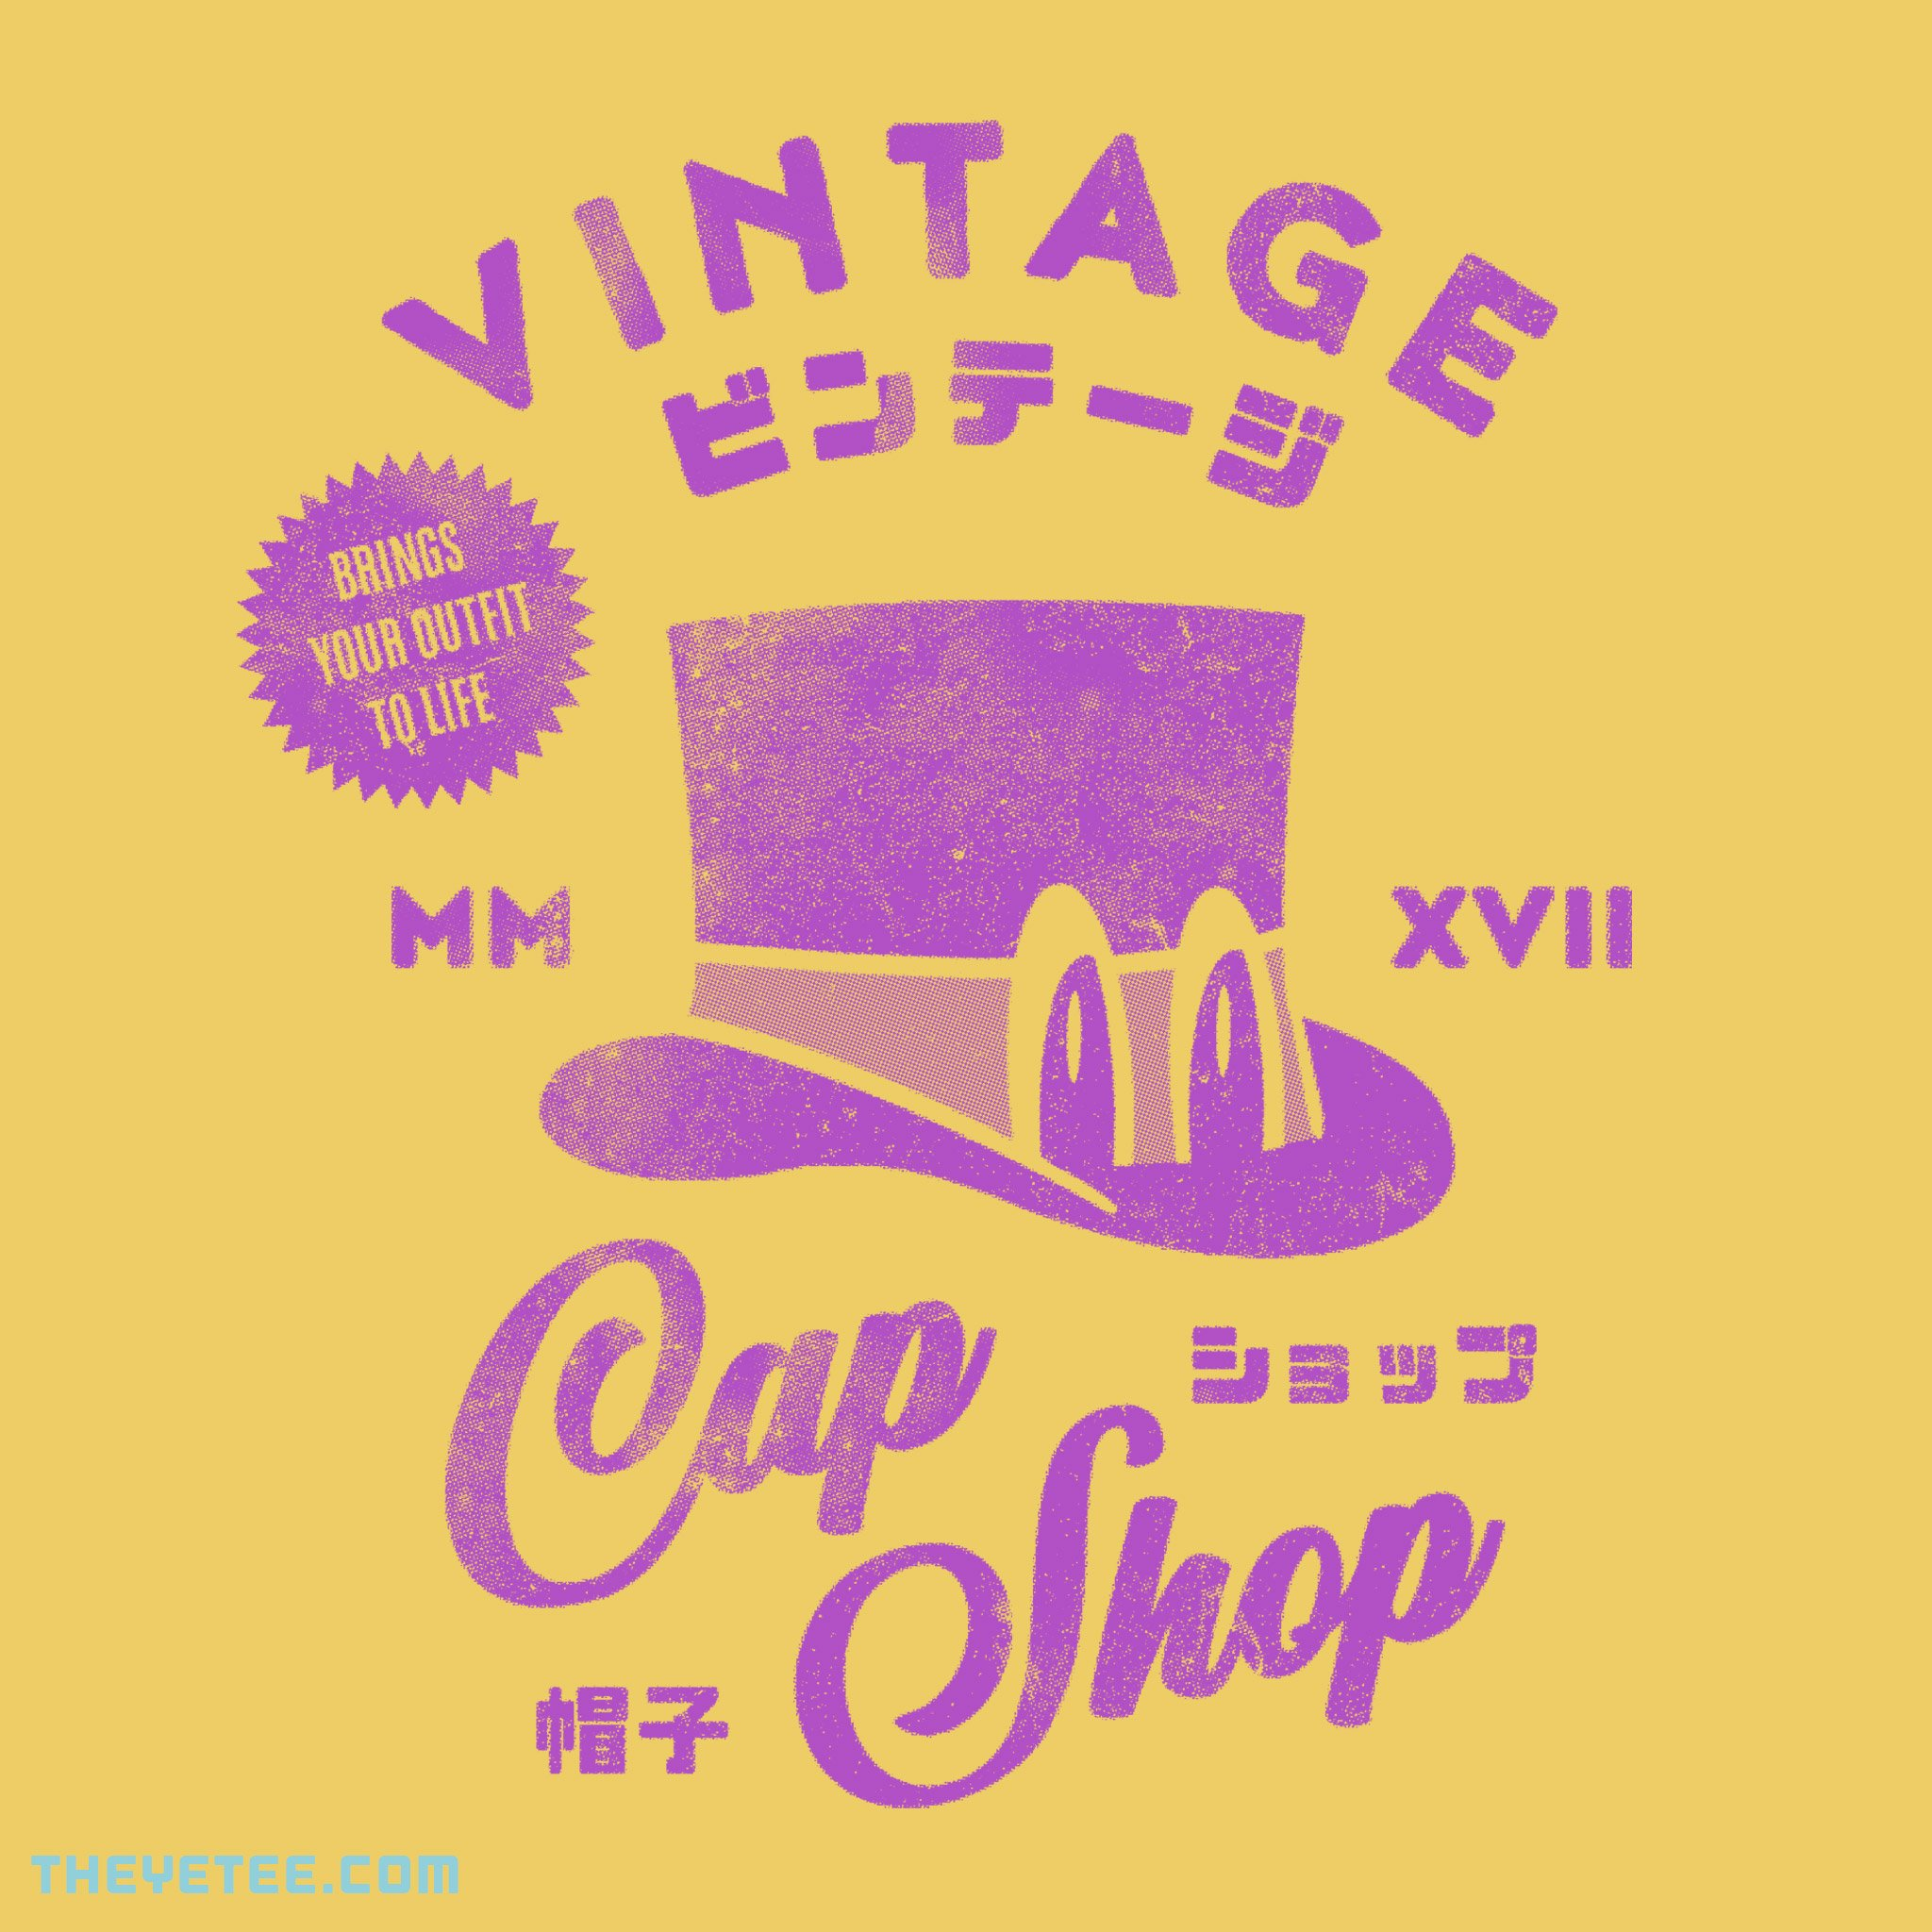 The Yetee: Vintage Cap Shop